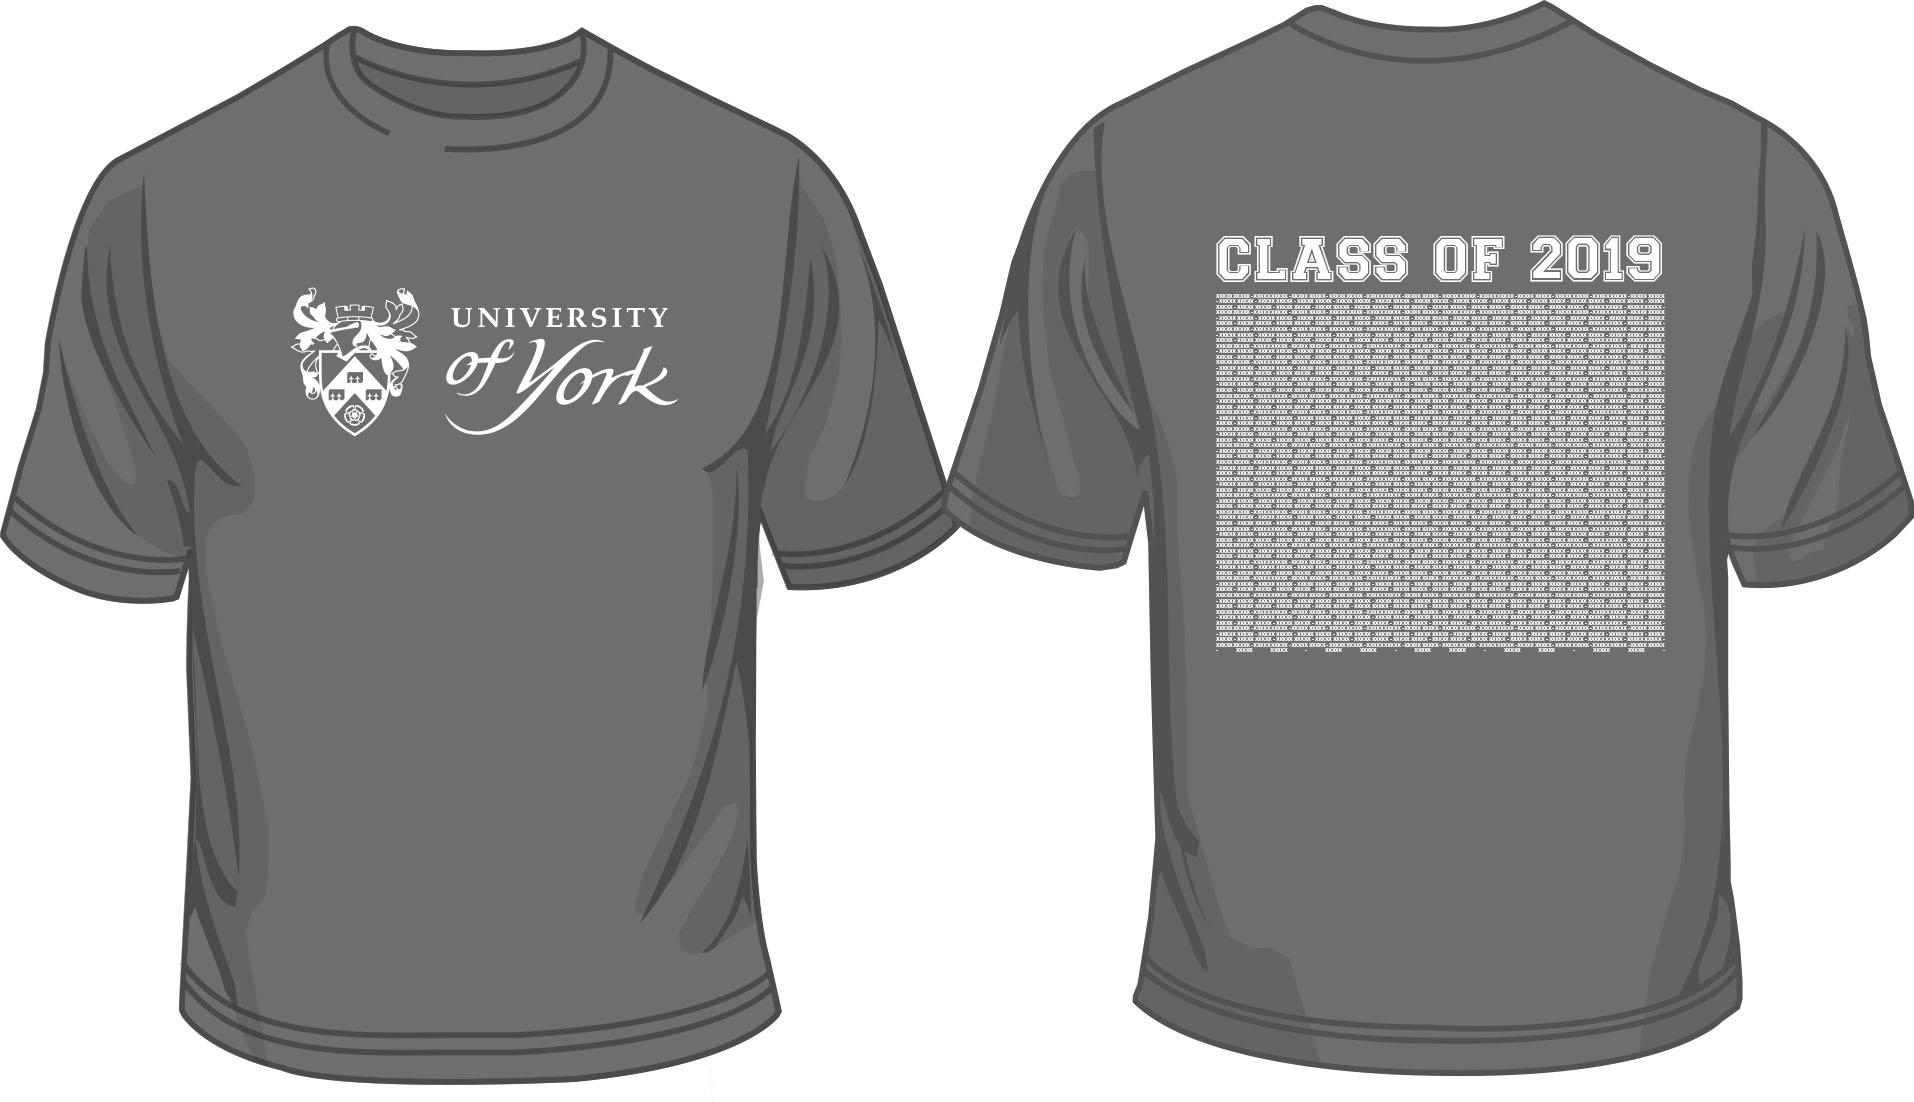 Graduation T-Shirt Saturday 20th July (Dark Grey)